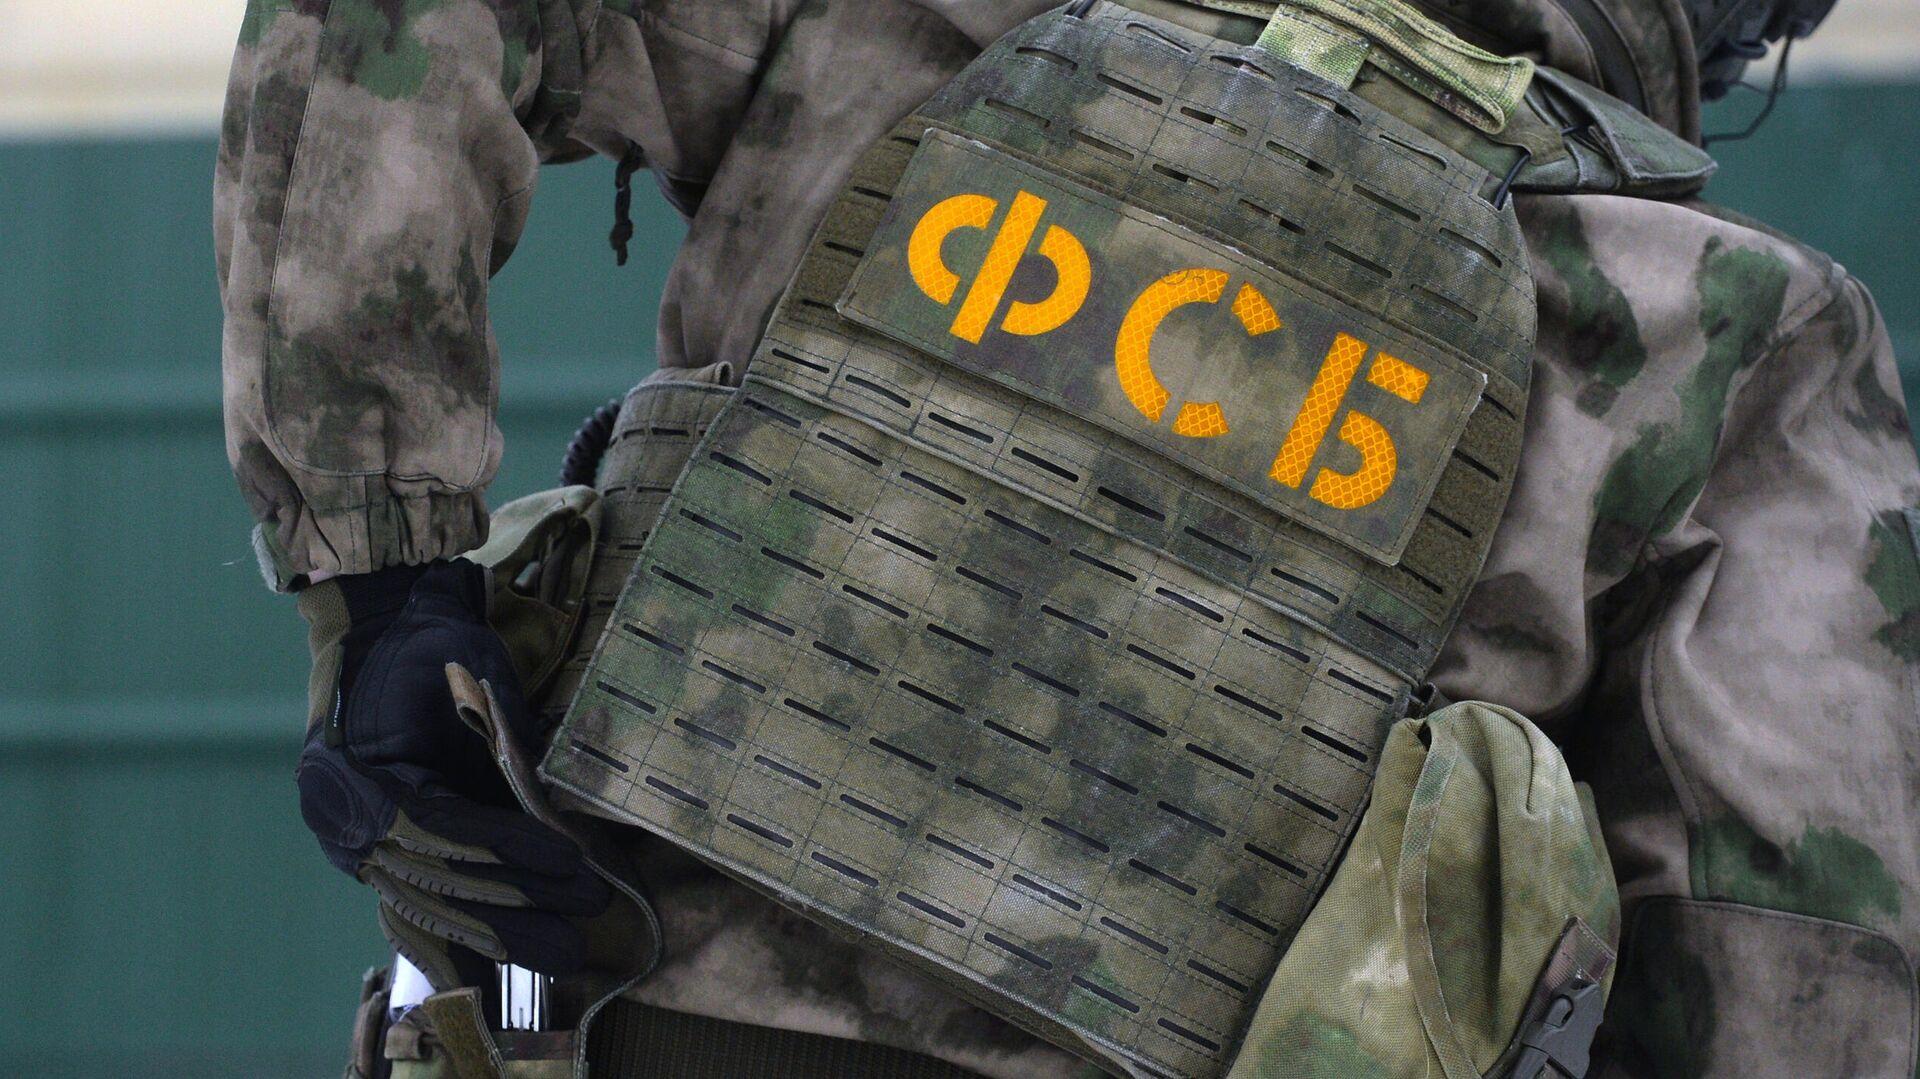 Сотрудник ФСБ - РИА Новости, 1920, 25.05.2021